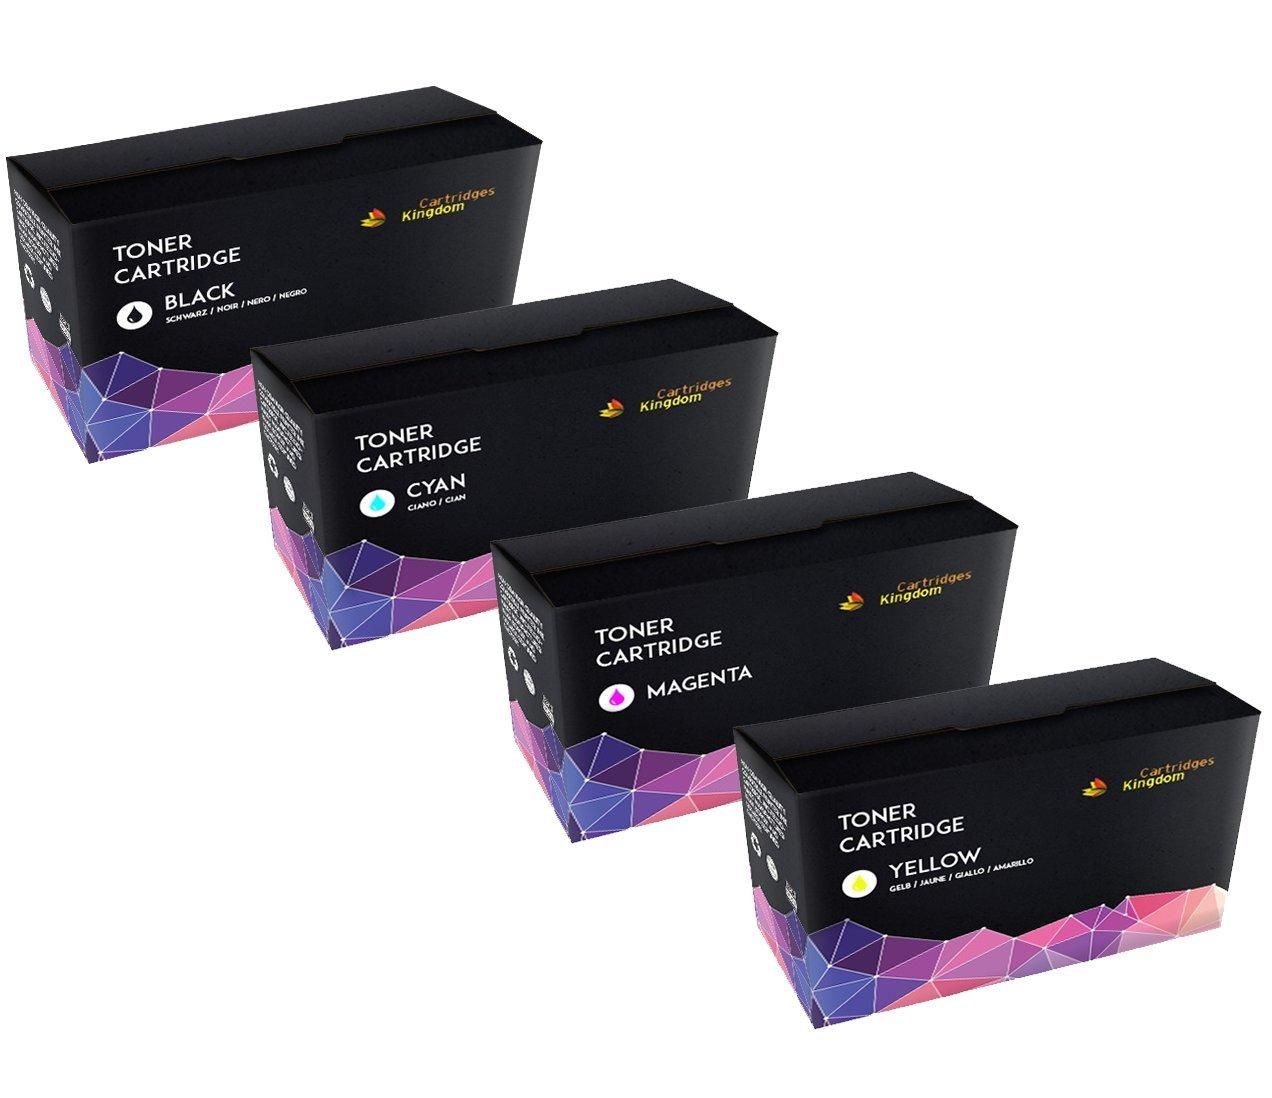 Cartridges Kingdom CLT-Y508L Giallo Toner compatibile per Samsung CLP-620ND, CLP-670N, CLP-670ND, CLX-6220FX, CLX-6250FX no Samsung Original